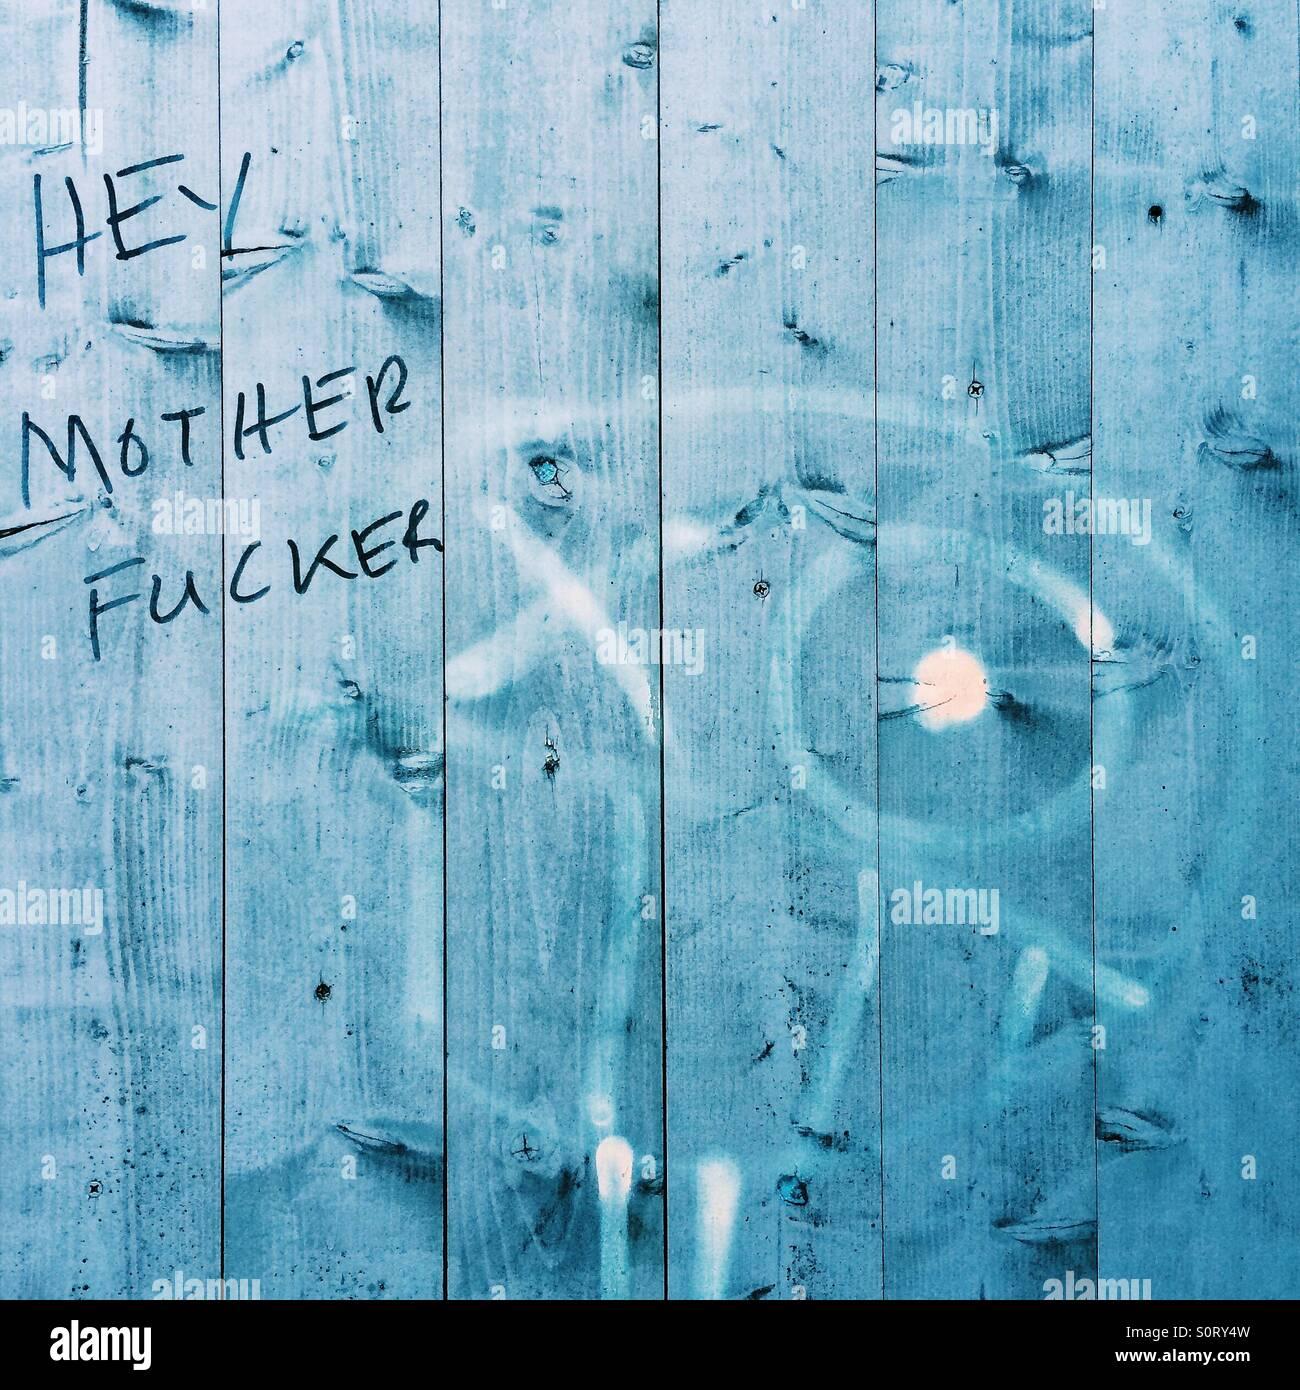 Colorido lenguaje Graffiti en la valla azul Imagen De Stock